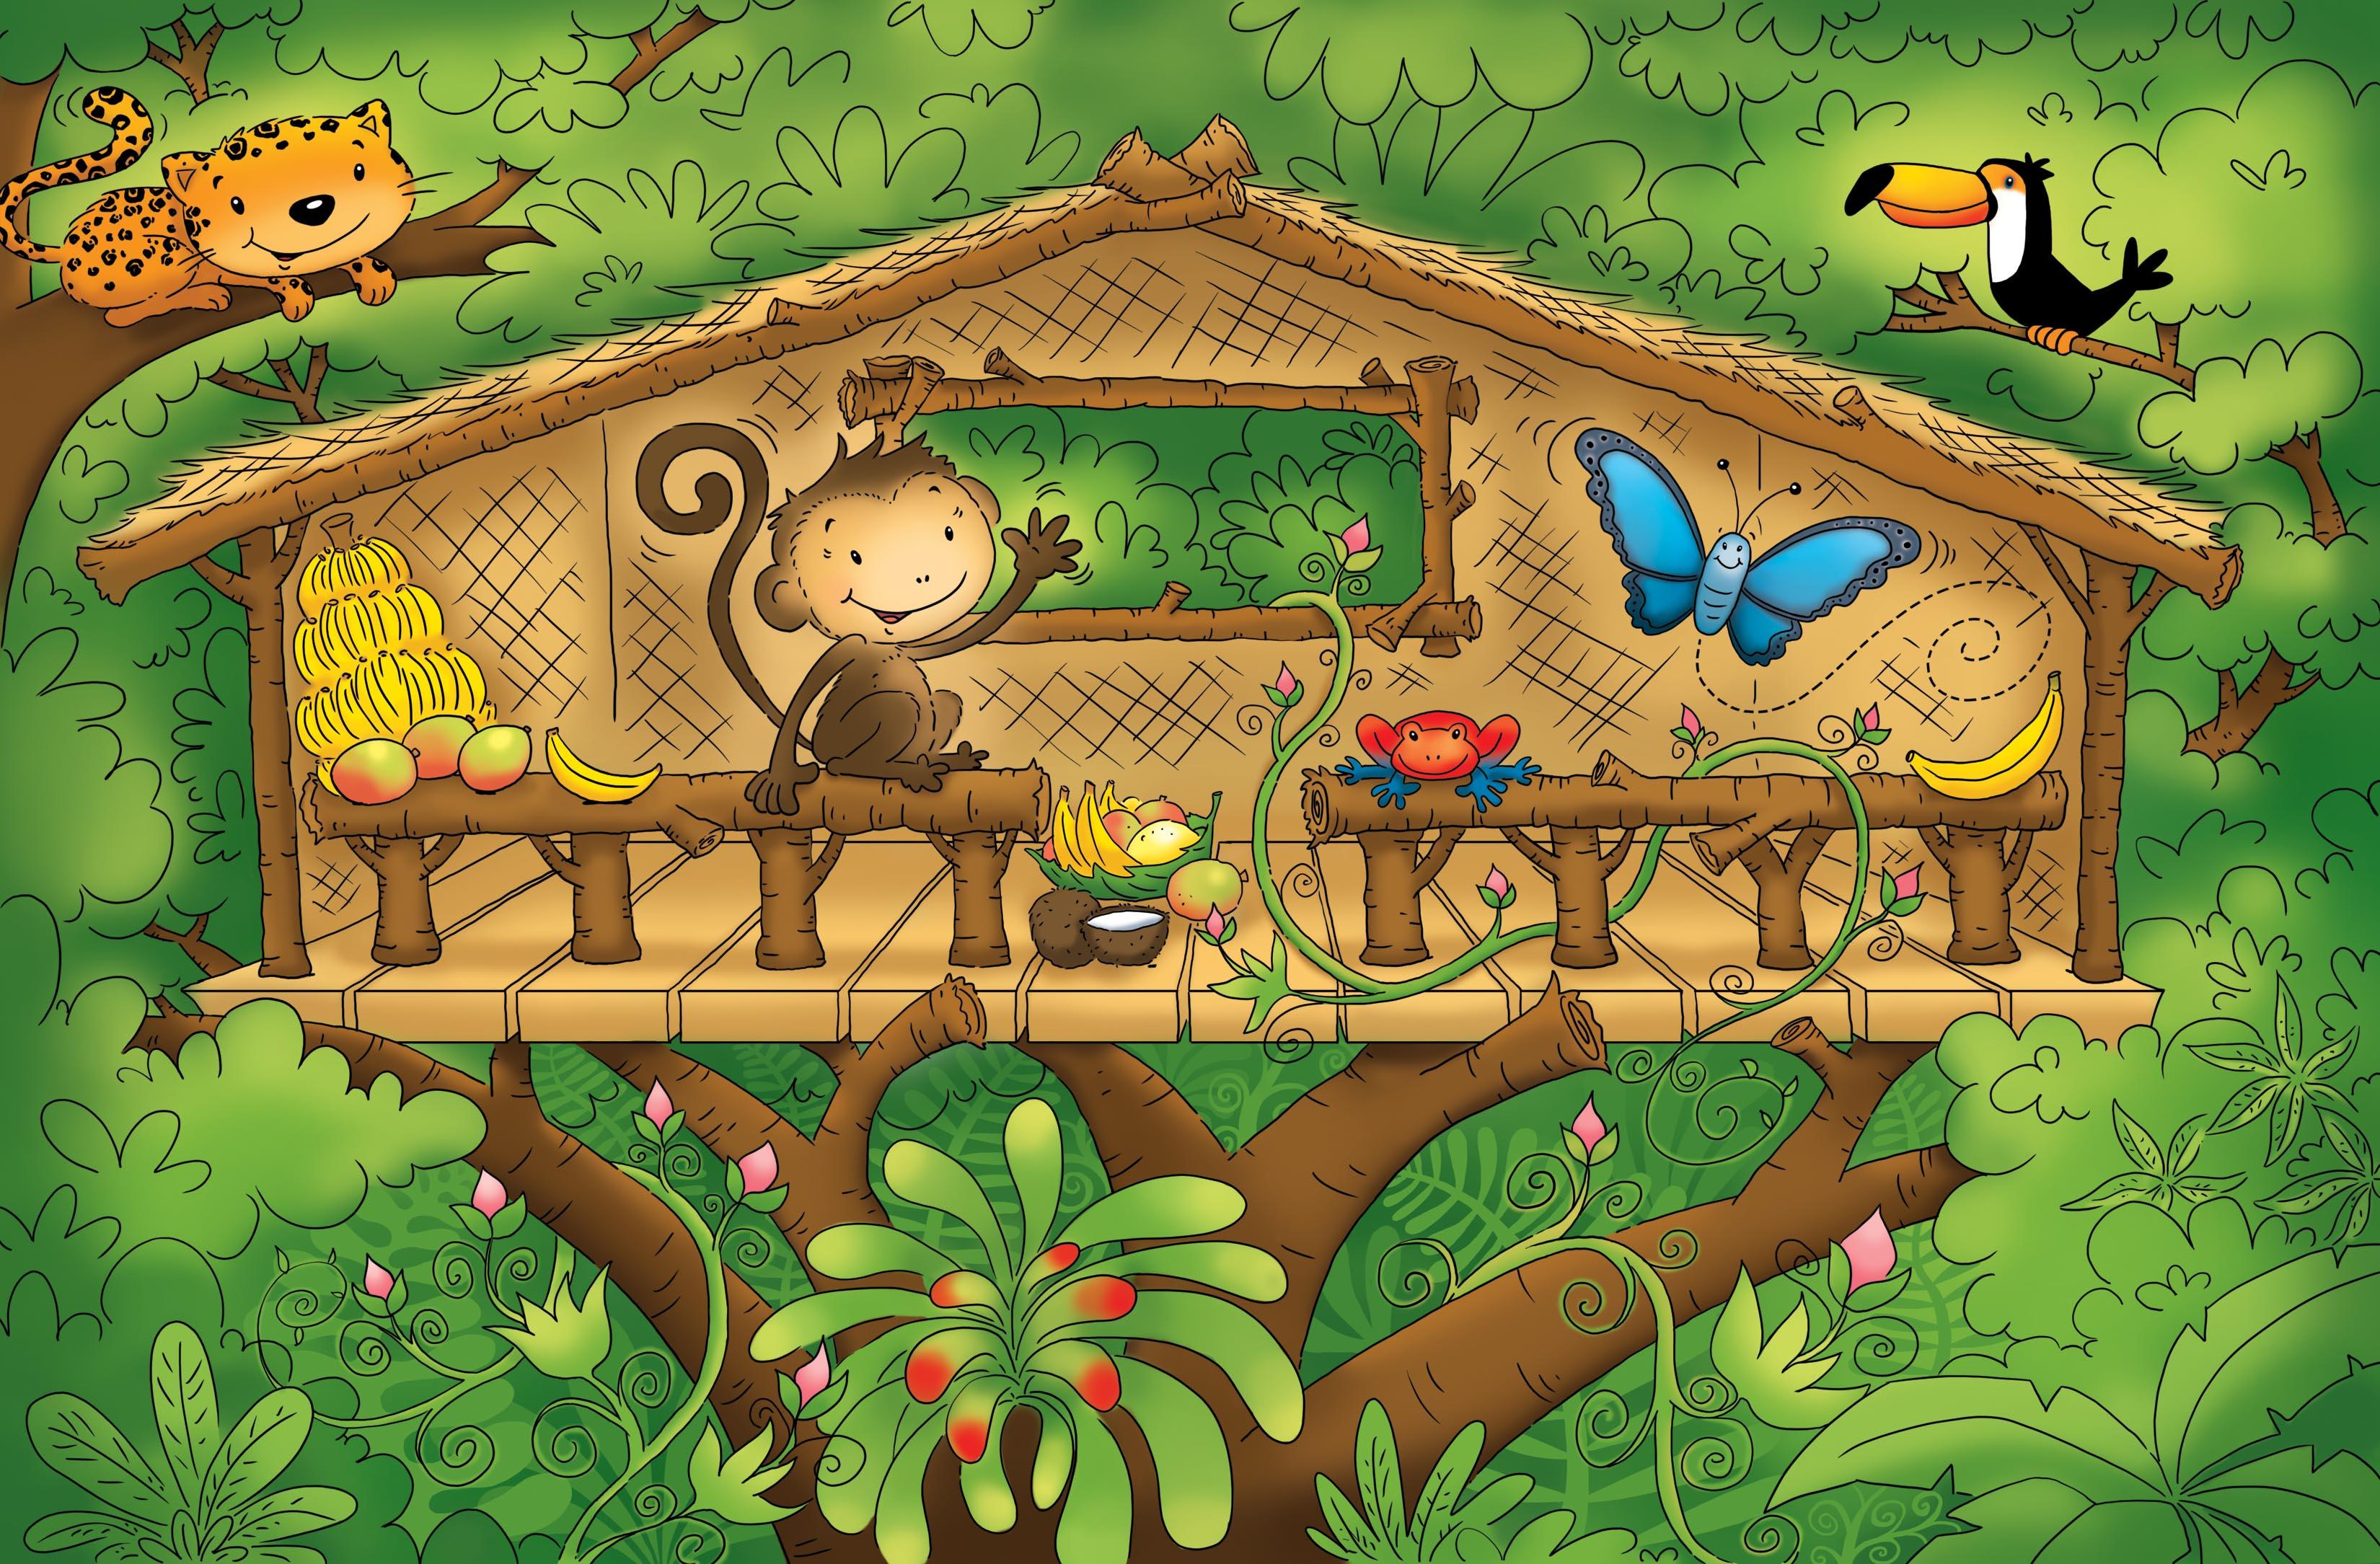 SonQuest Rainforest VBS > Fun 4 Kids